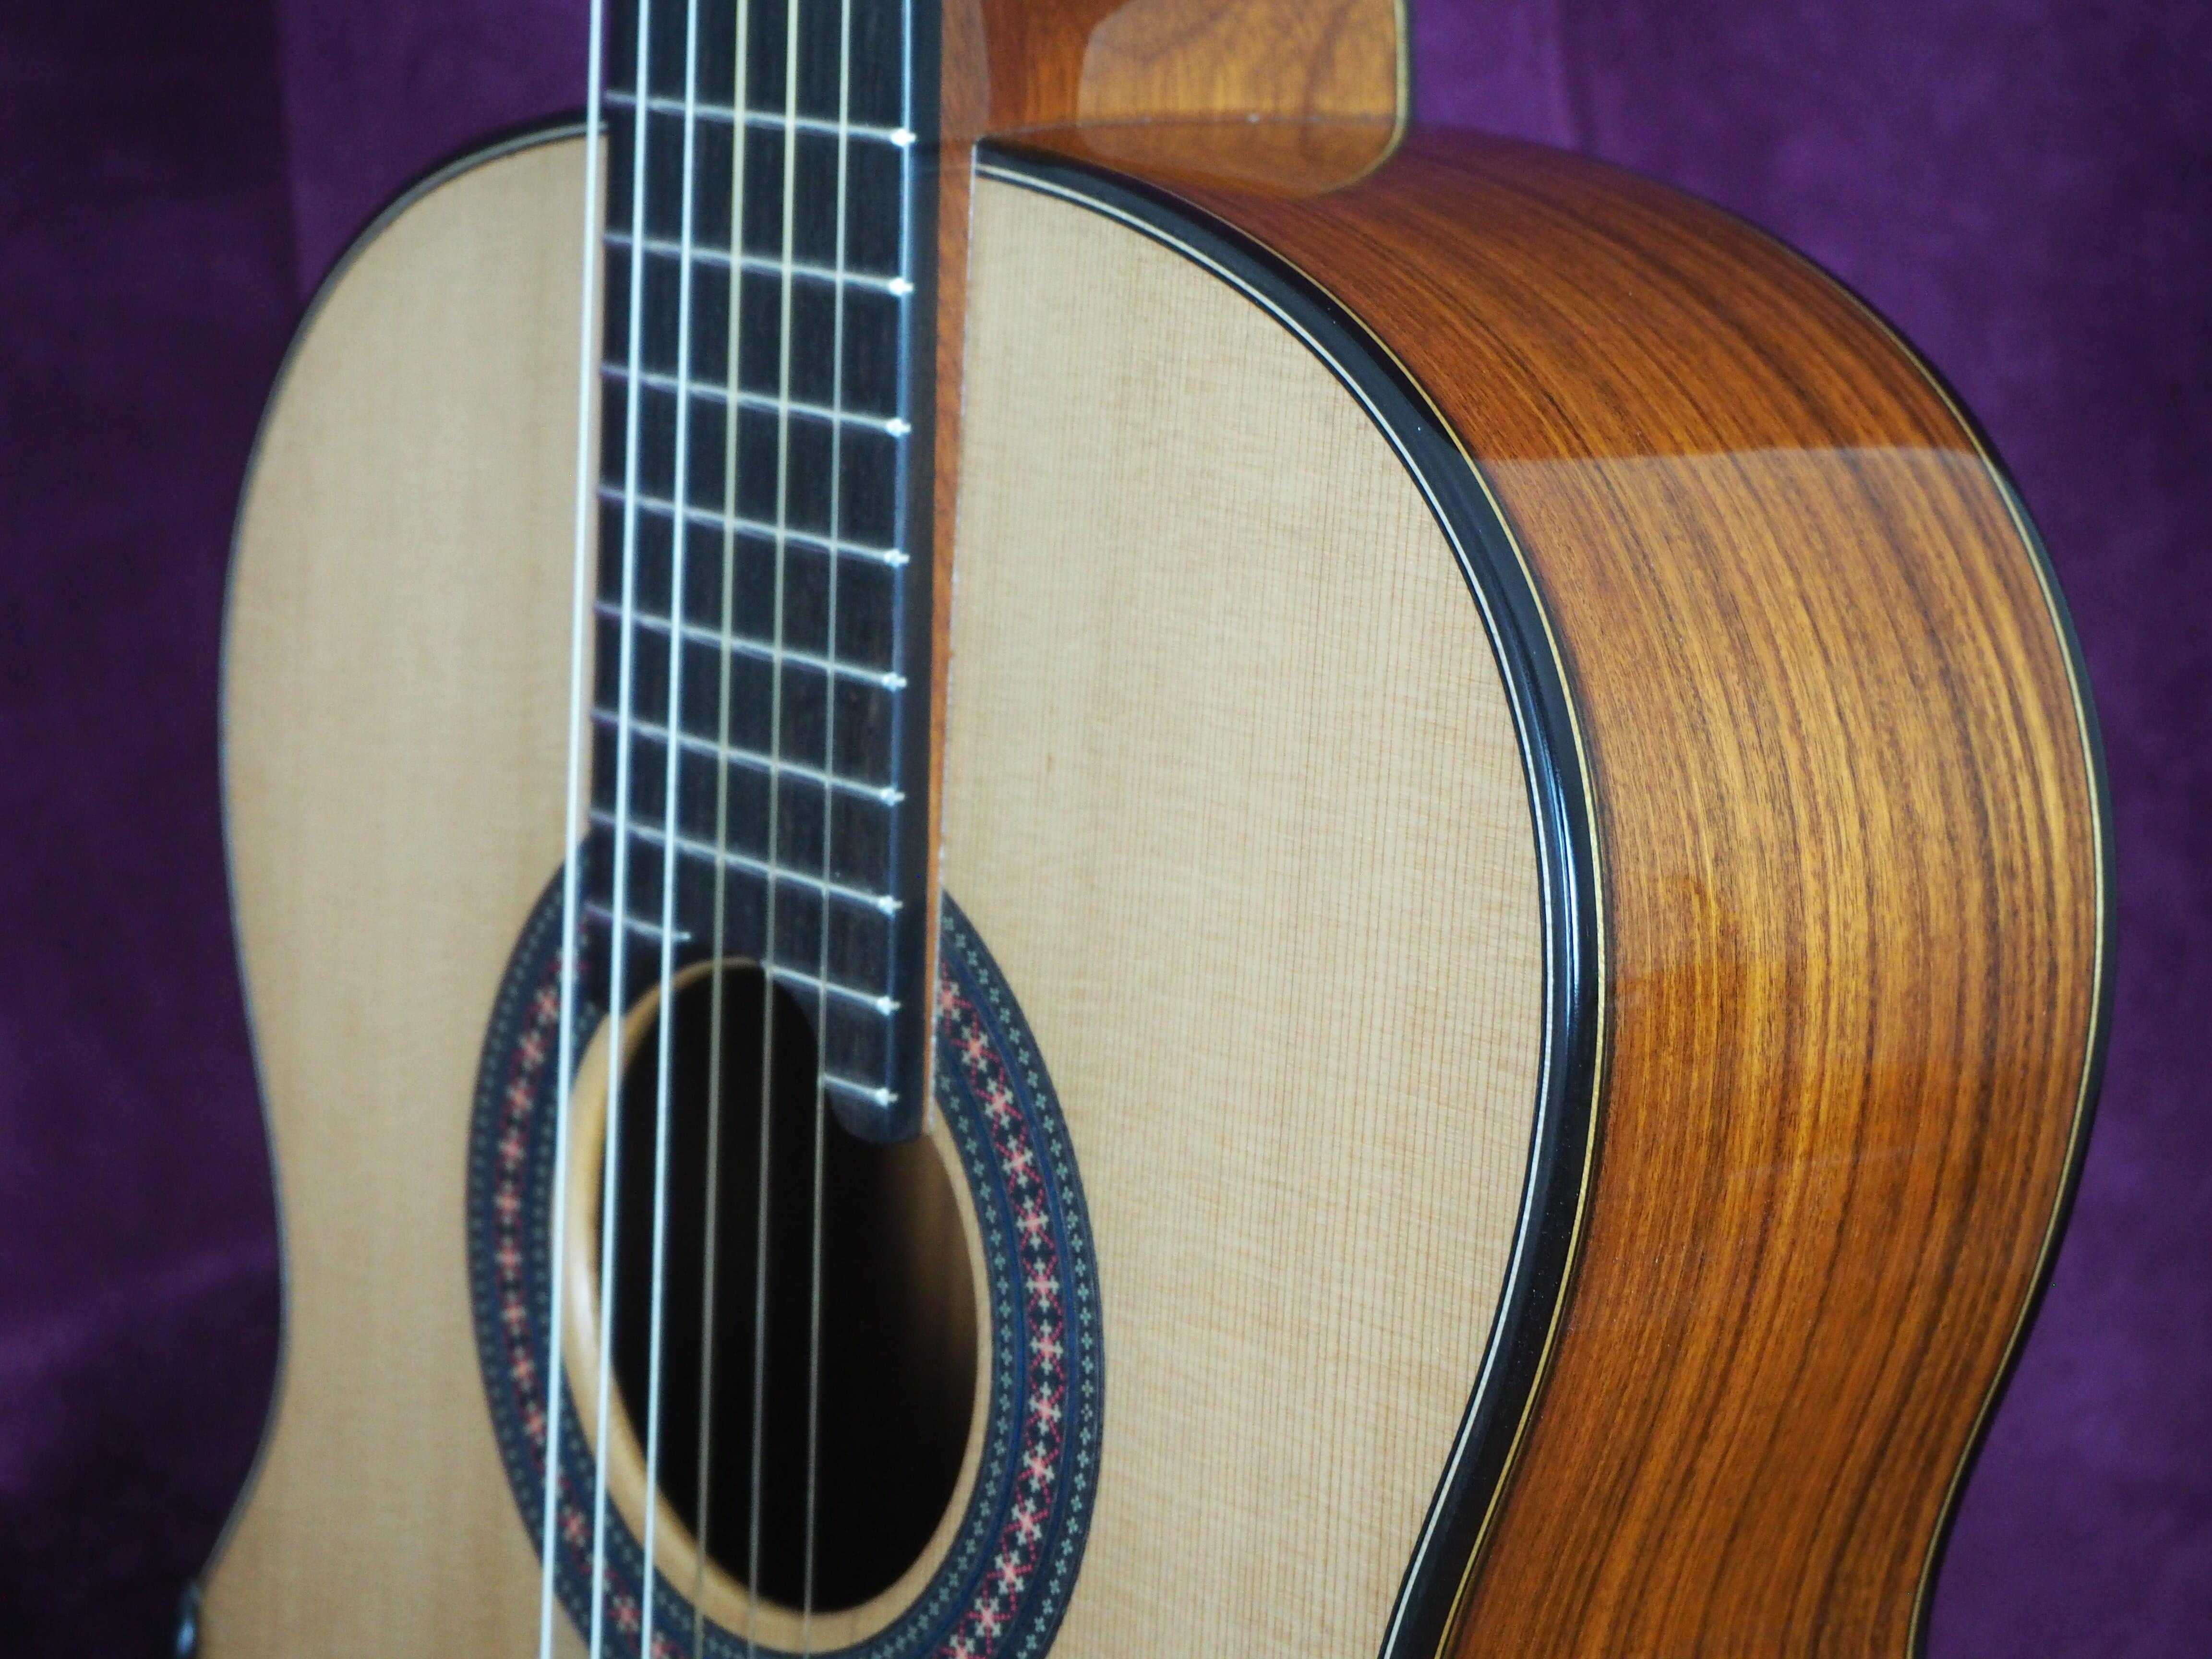 luthier robin moyes 2016 classical guitar classical concert guitar. Black Bedroom Furniture Sets. Home Design Ideas